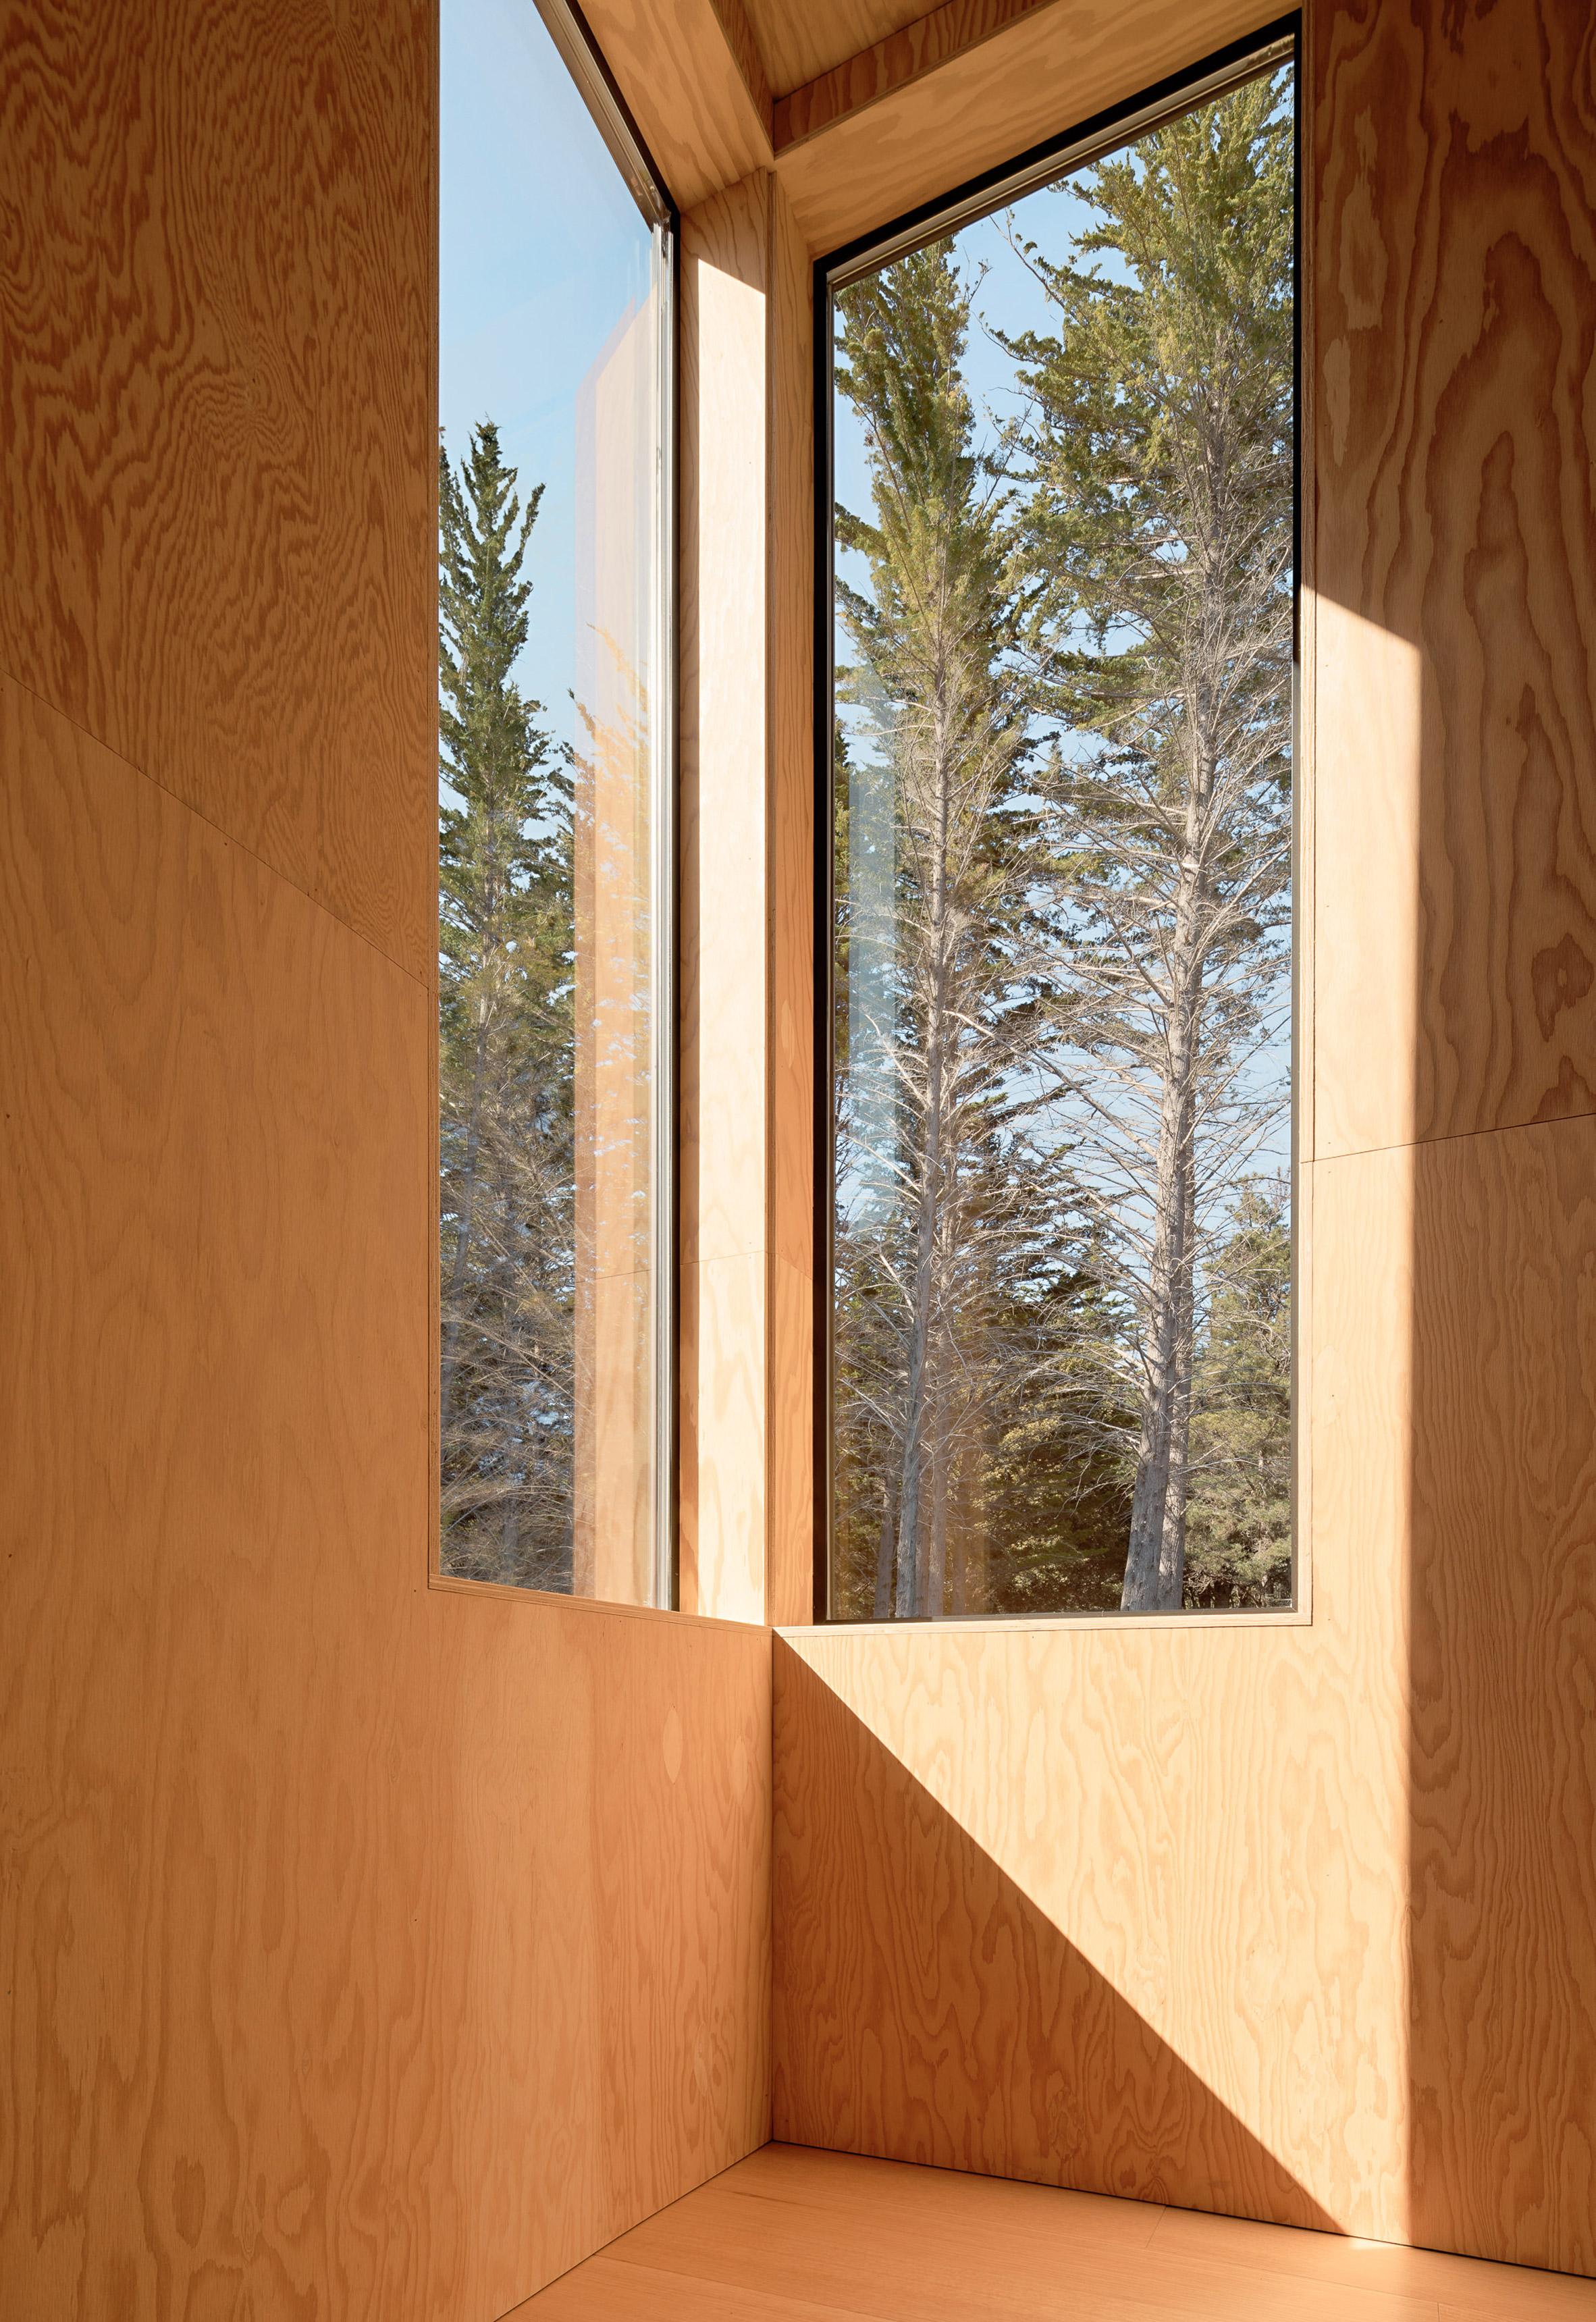 nhà bên biển coastal-retreat-malcolm-davis-architecture-sea-ranch-sonoma-county-califorinia-relaxing-space-elledecoration vn 10